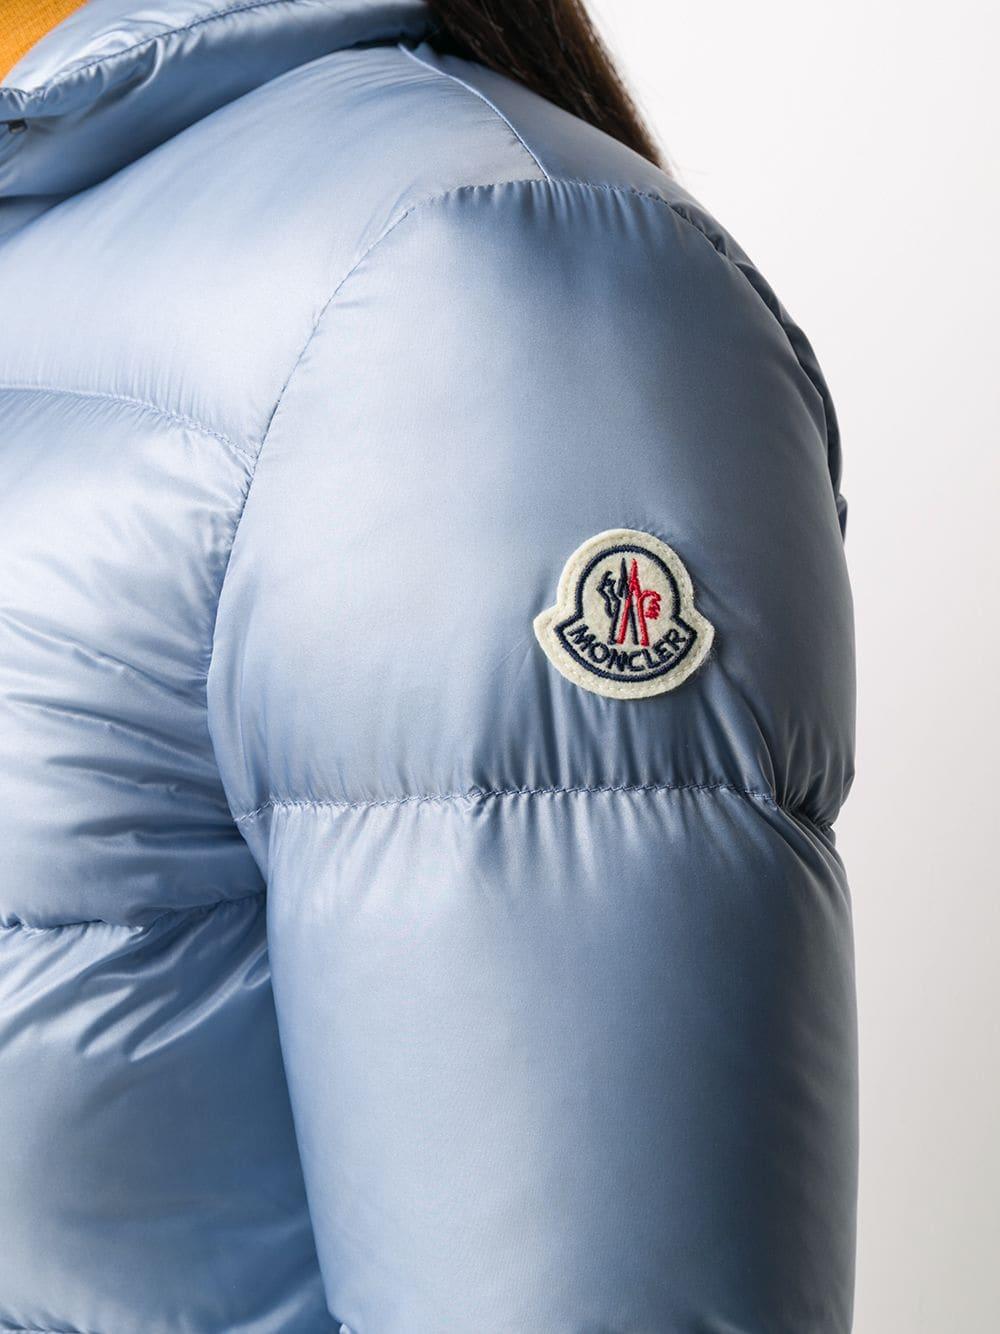 piumino azzurro Lannic in nylion e piuma d'oca MONCLER | Piumini | LANNIC 1A202-00-C0229715